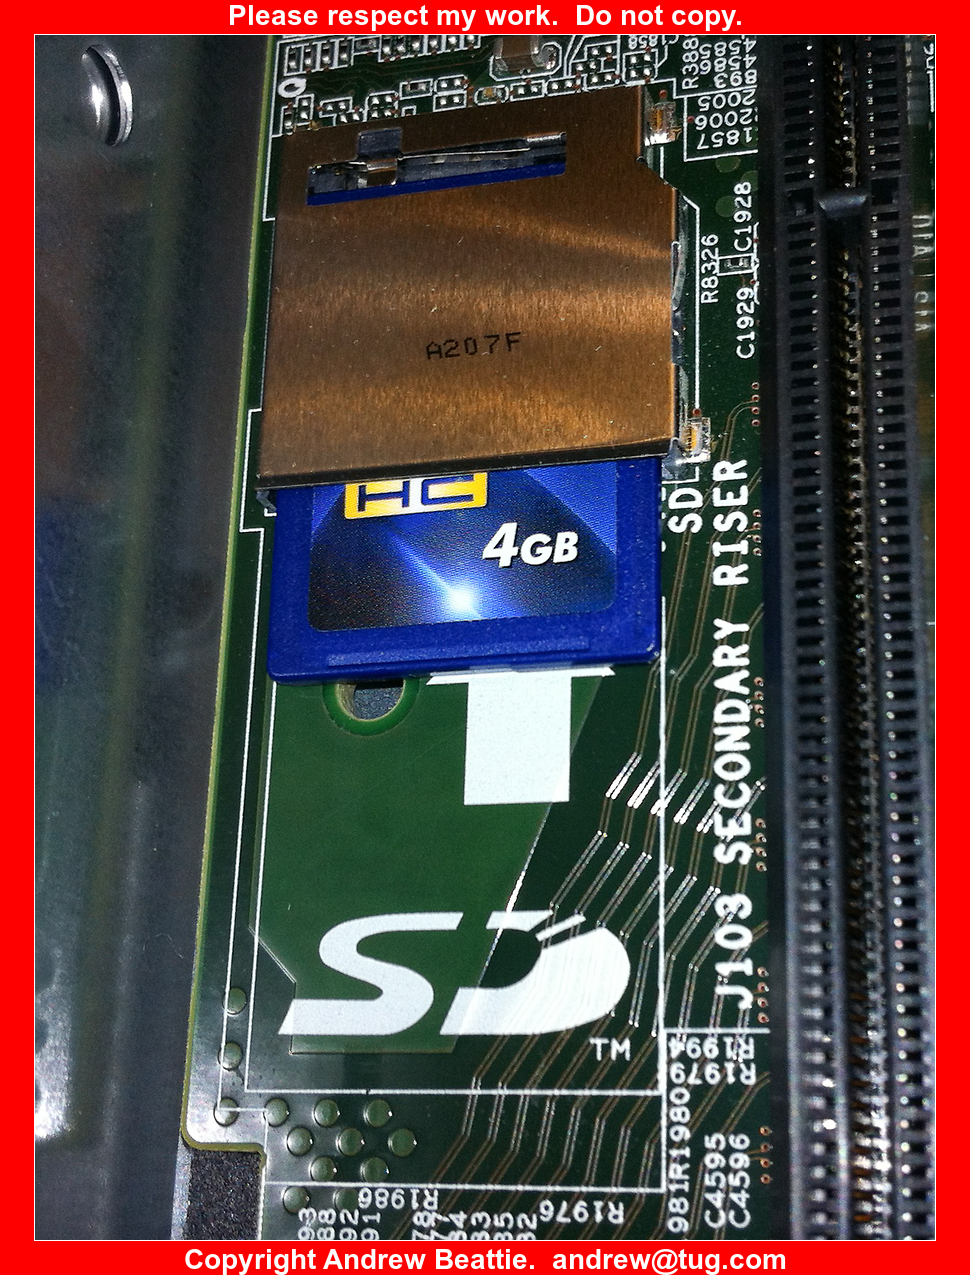 Dl360 g7 dimm slots